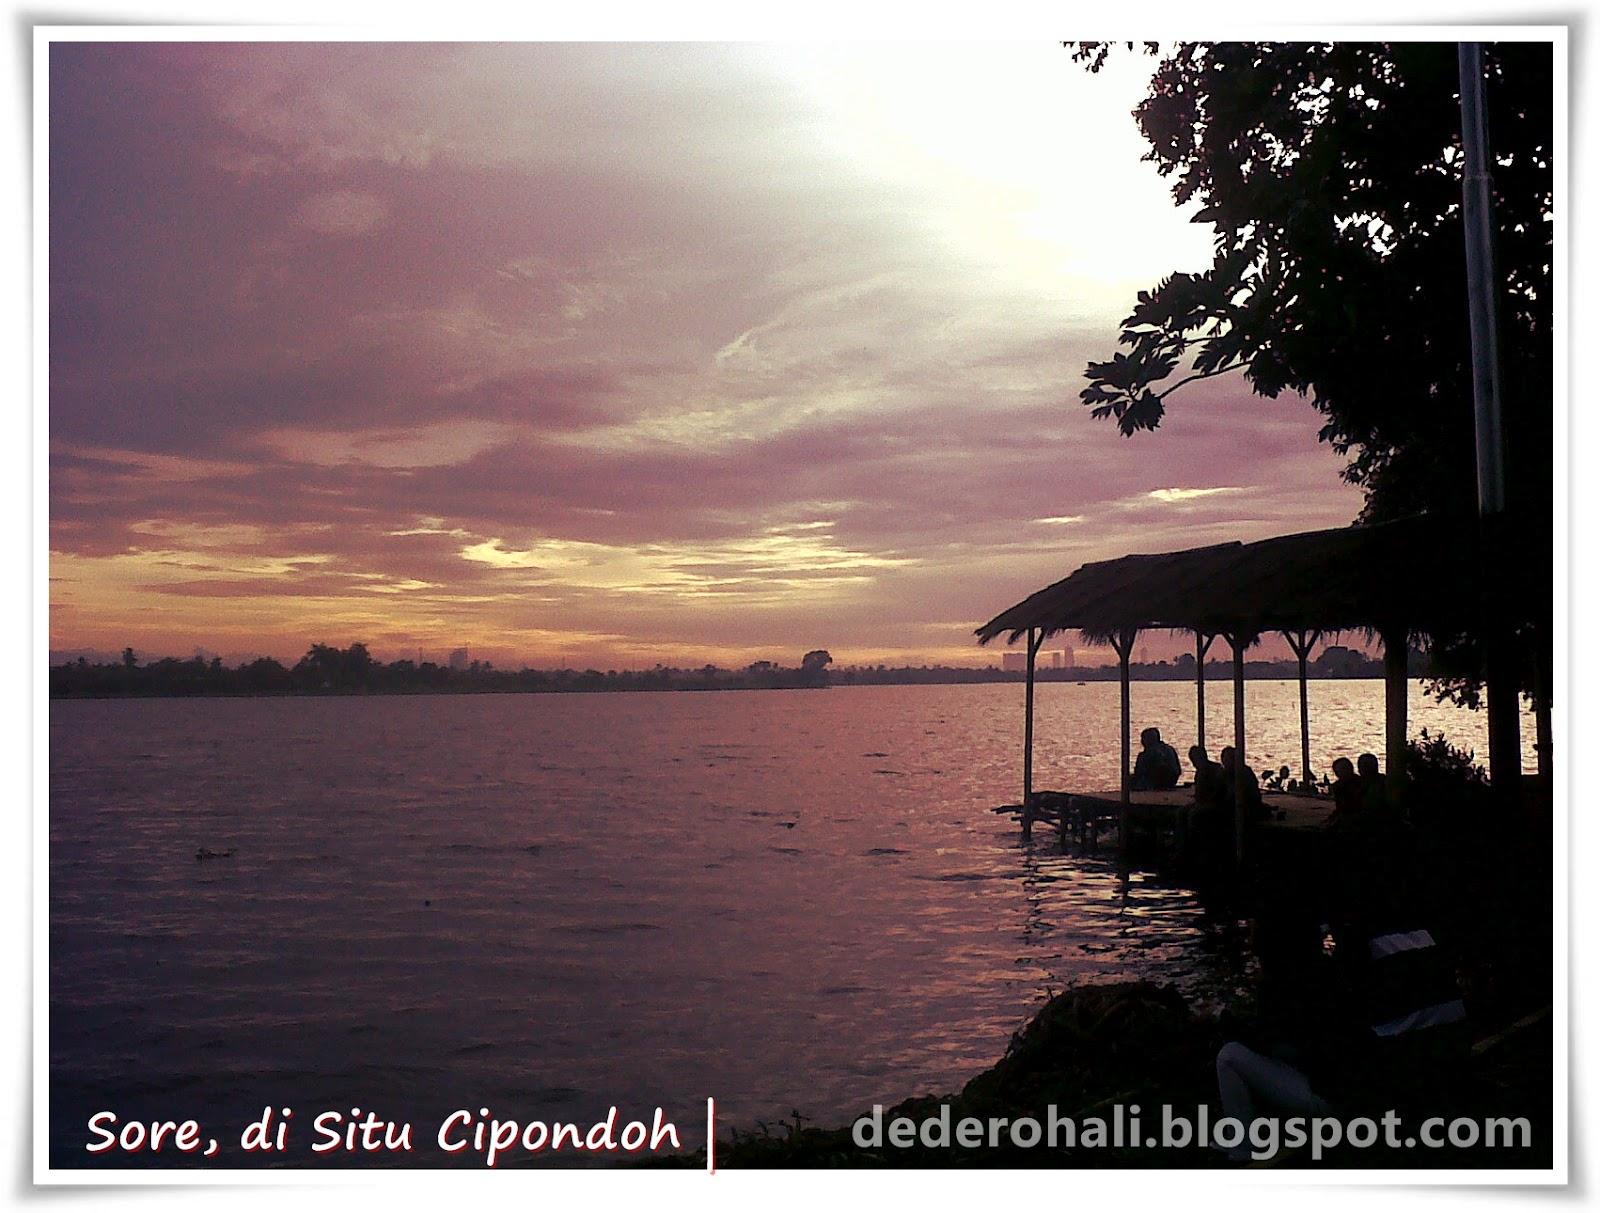 Februari 2012 Sapadede Blog Berada Jalan Hasyim Ashari Kecamatan Cipondoh